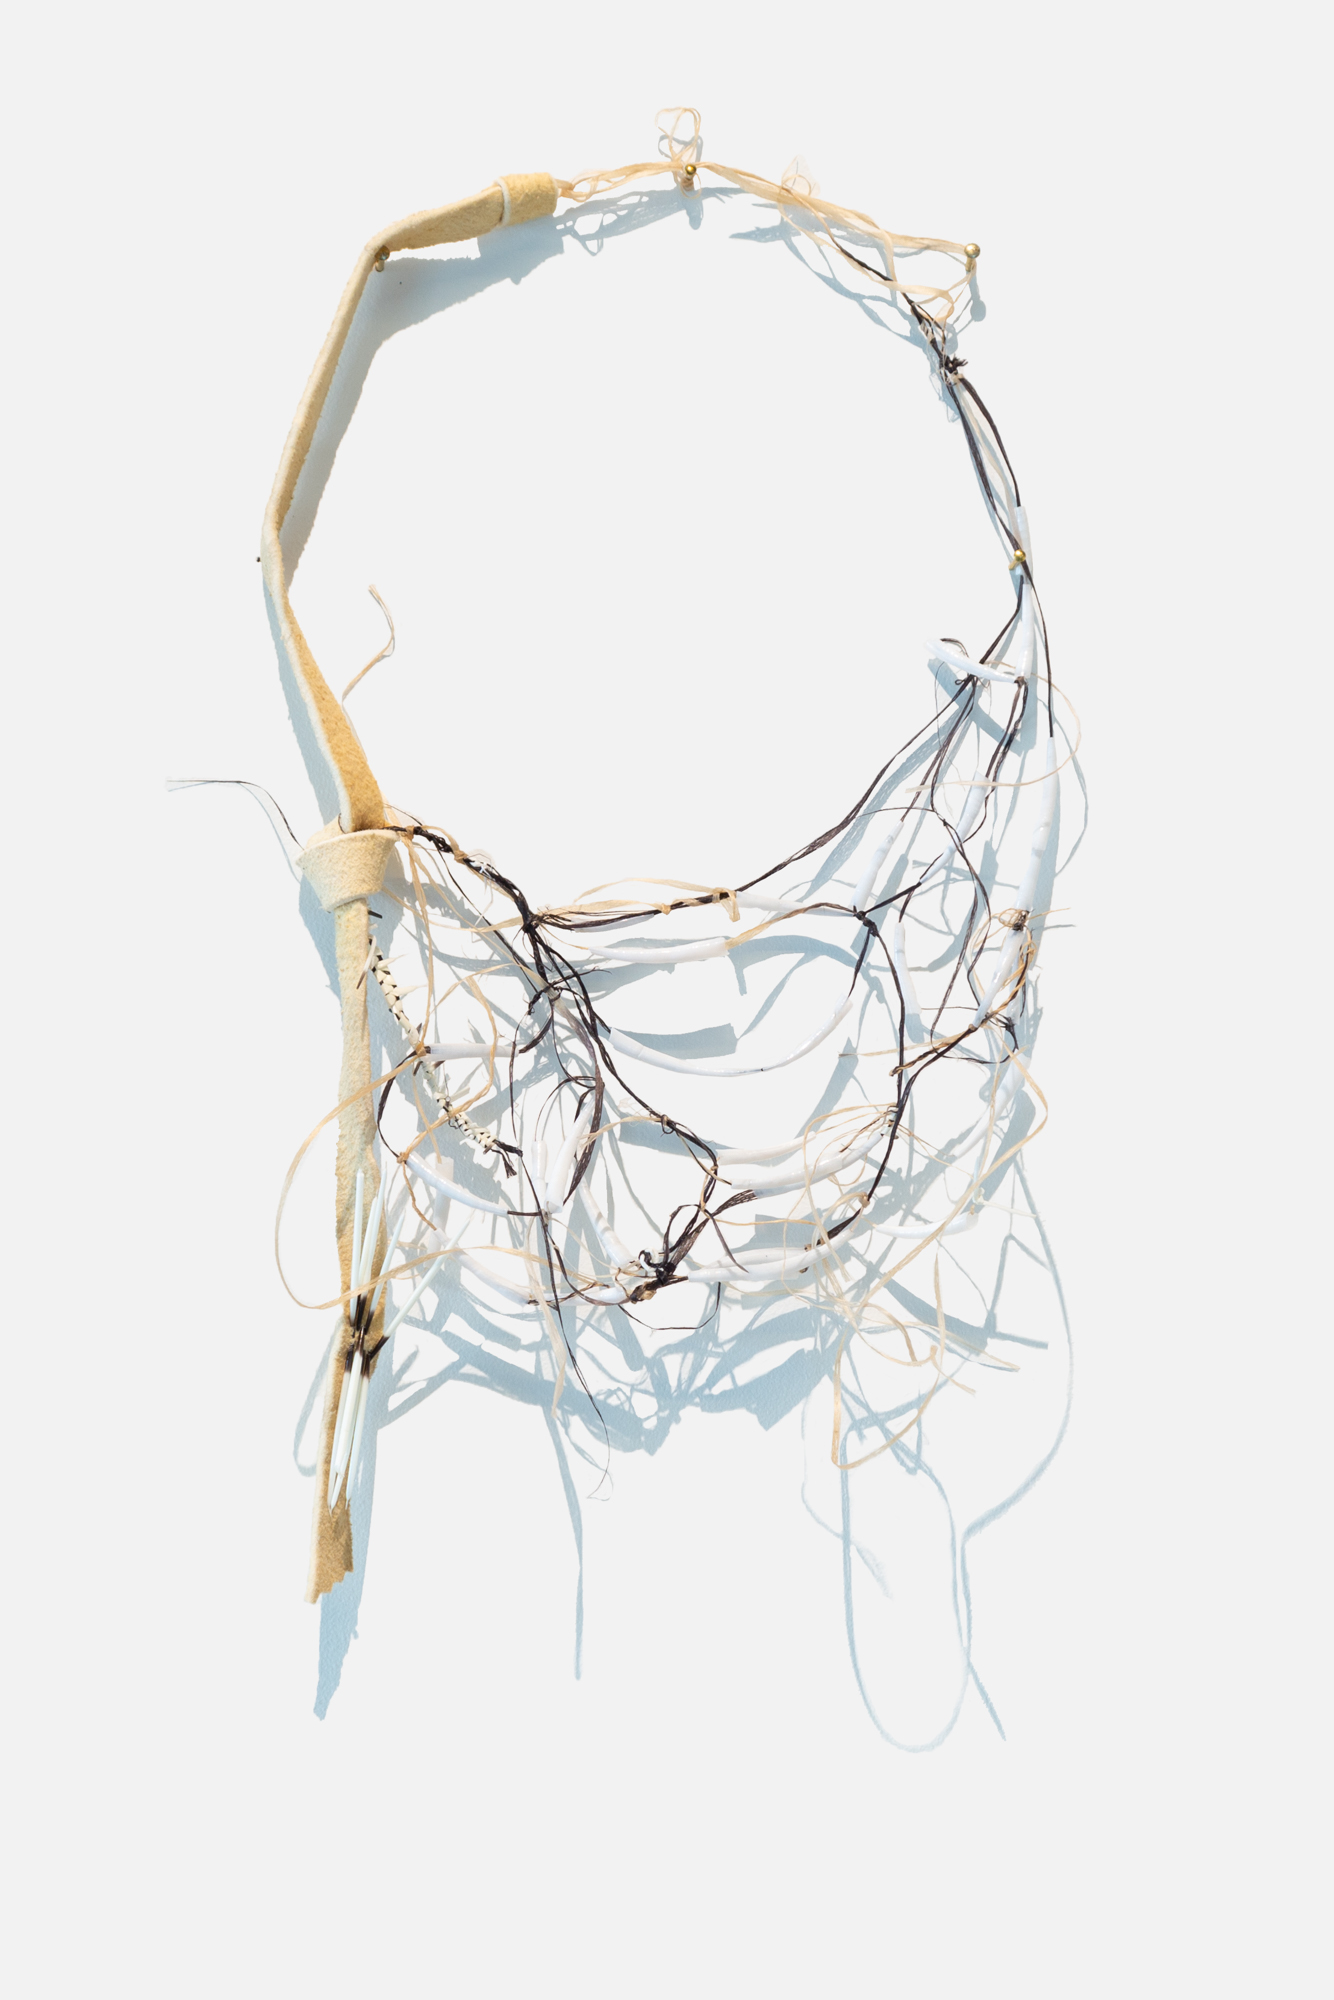 Piercing Mind (Veil)